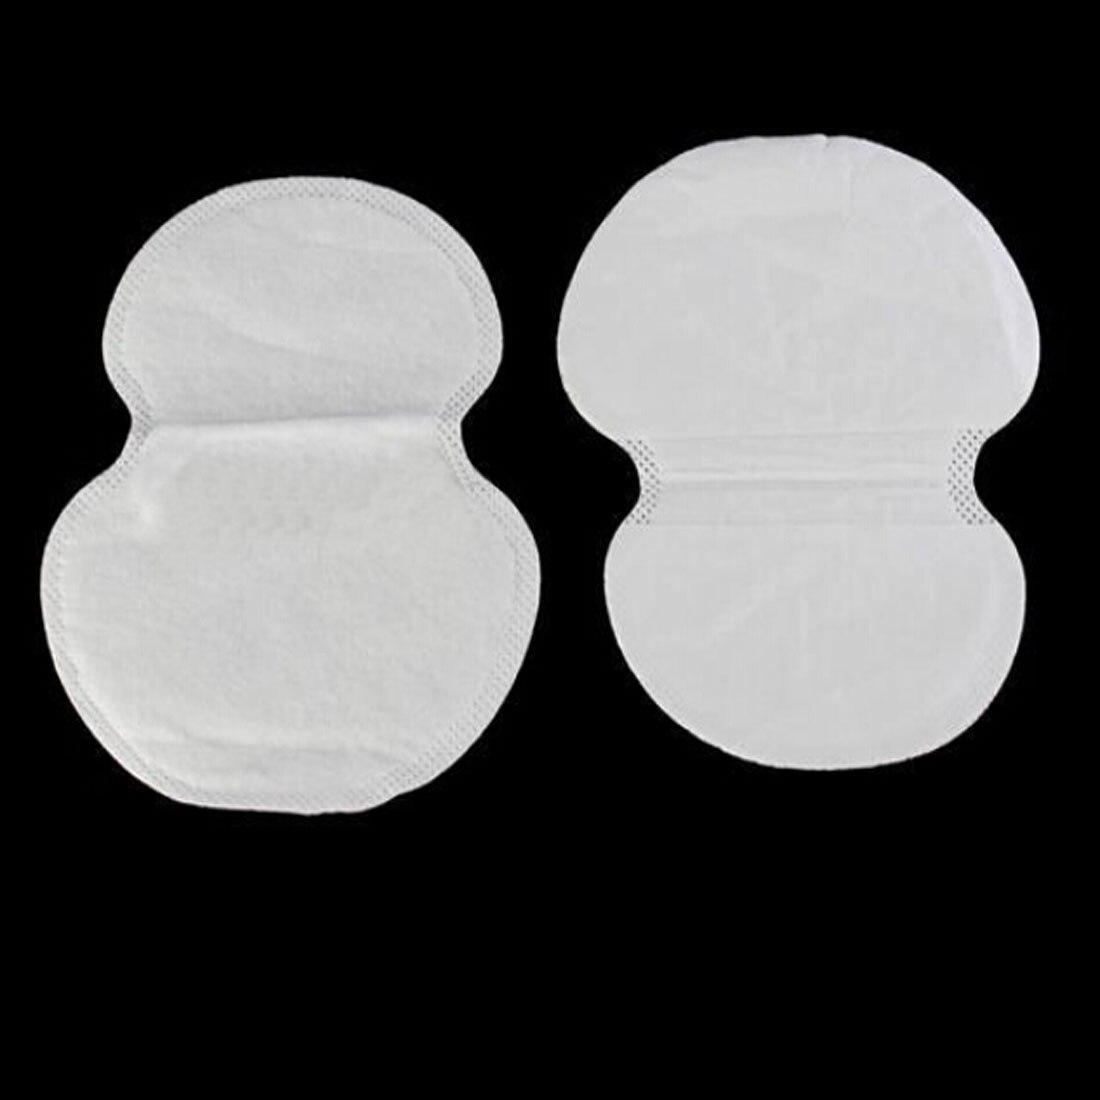 50pcs / 24pcs / 10pcs Underarm Dress Clothing Armpit Care Sweat Scent Perspiration Pad Shield Absorbing Deodorant Antiperspirant 2